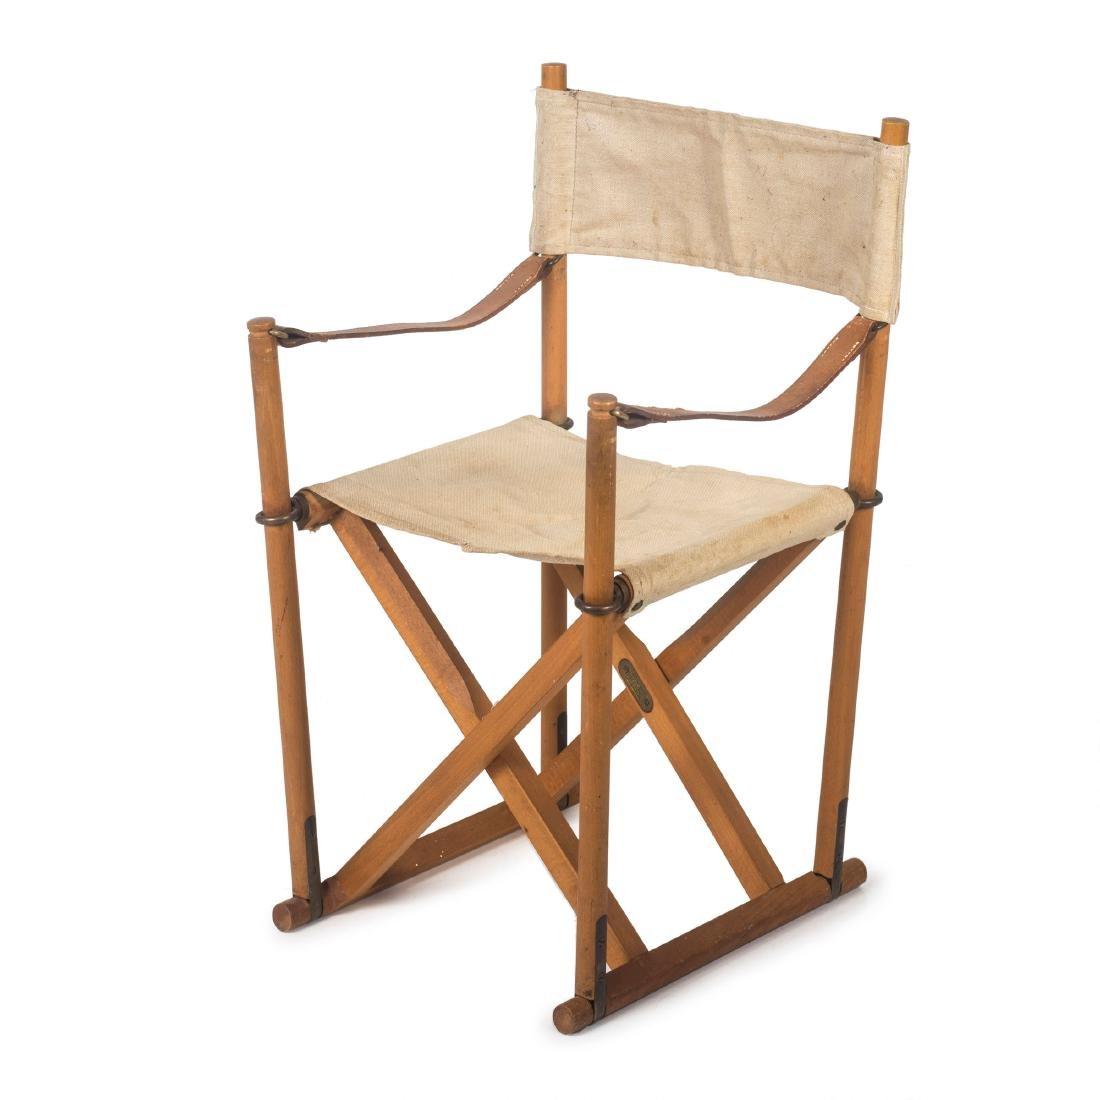 'MK16' child's folding chair, 1932